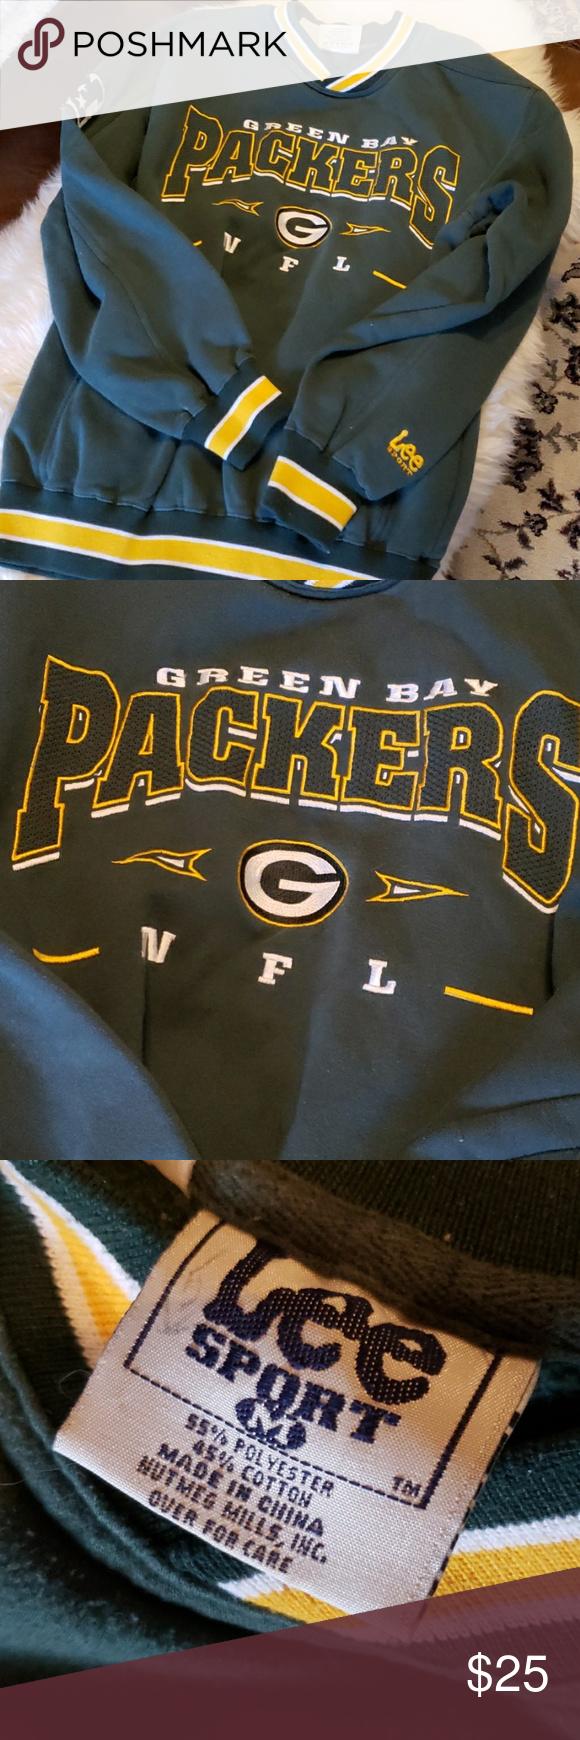 026e6099 Green Bay Packers Sweatshirt Green Bay Packers sweatshirt, Lee Sport ...